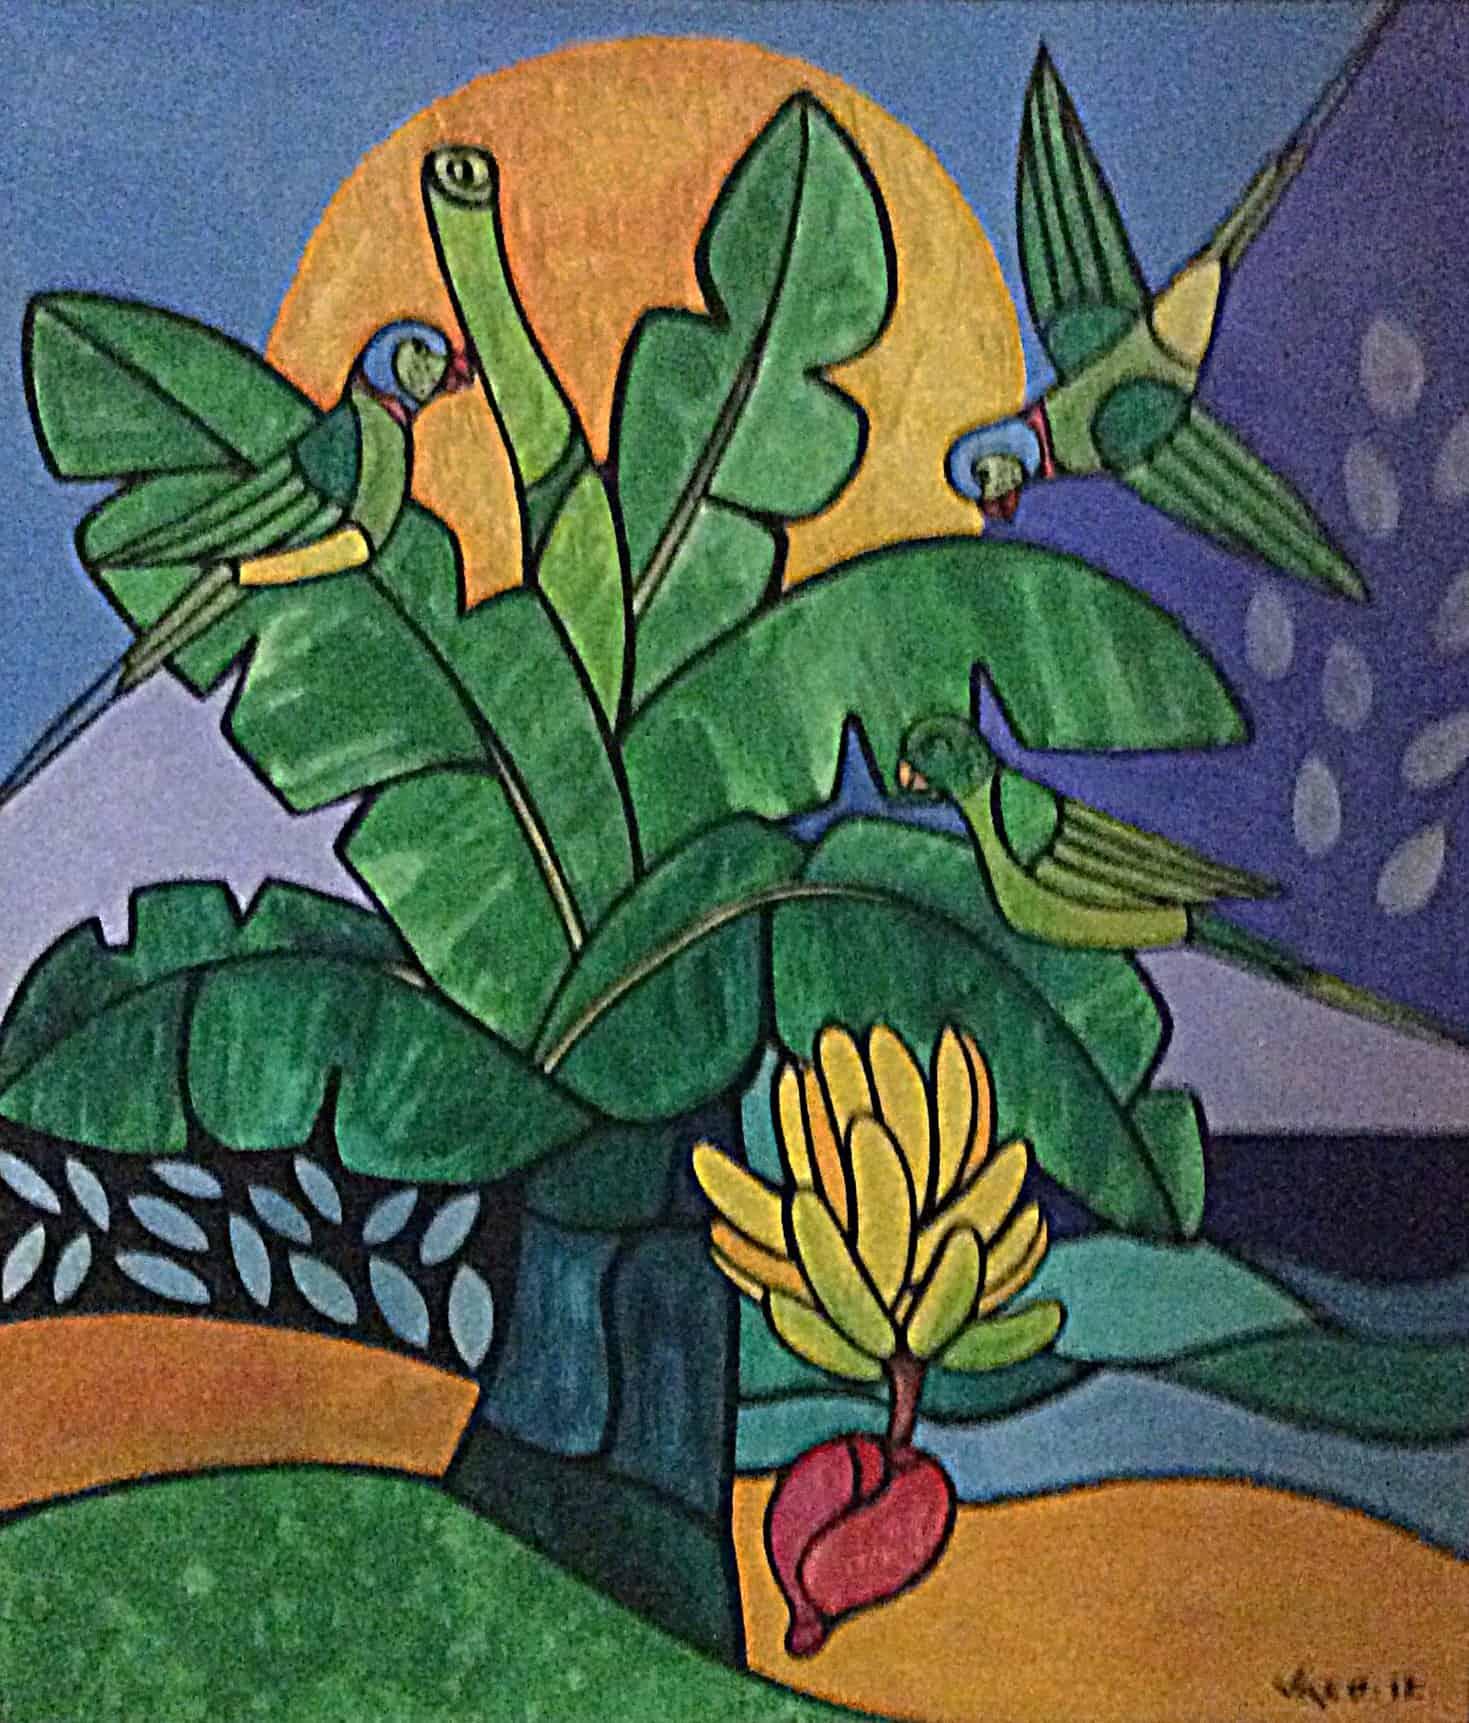 mauritius_arts_vaco_baissac_la_bananier